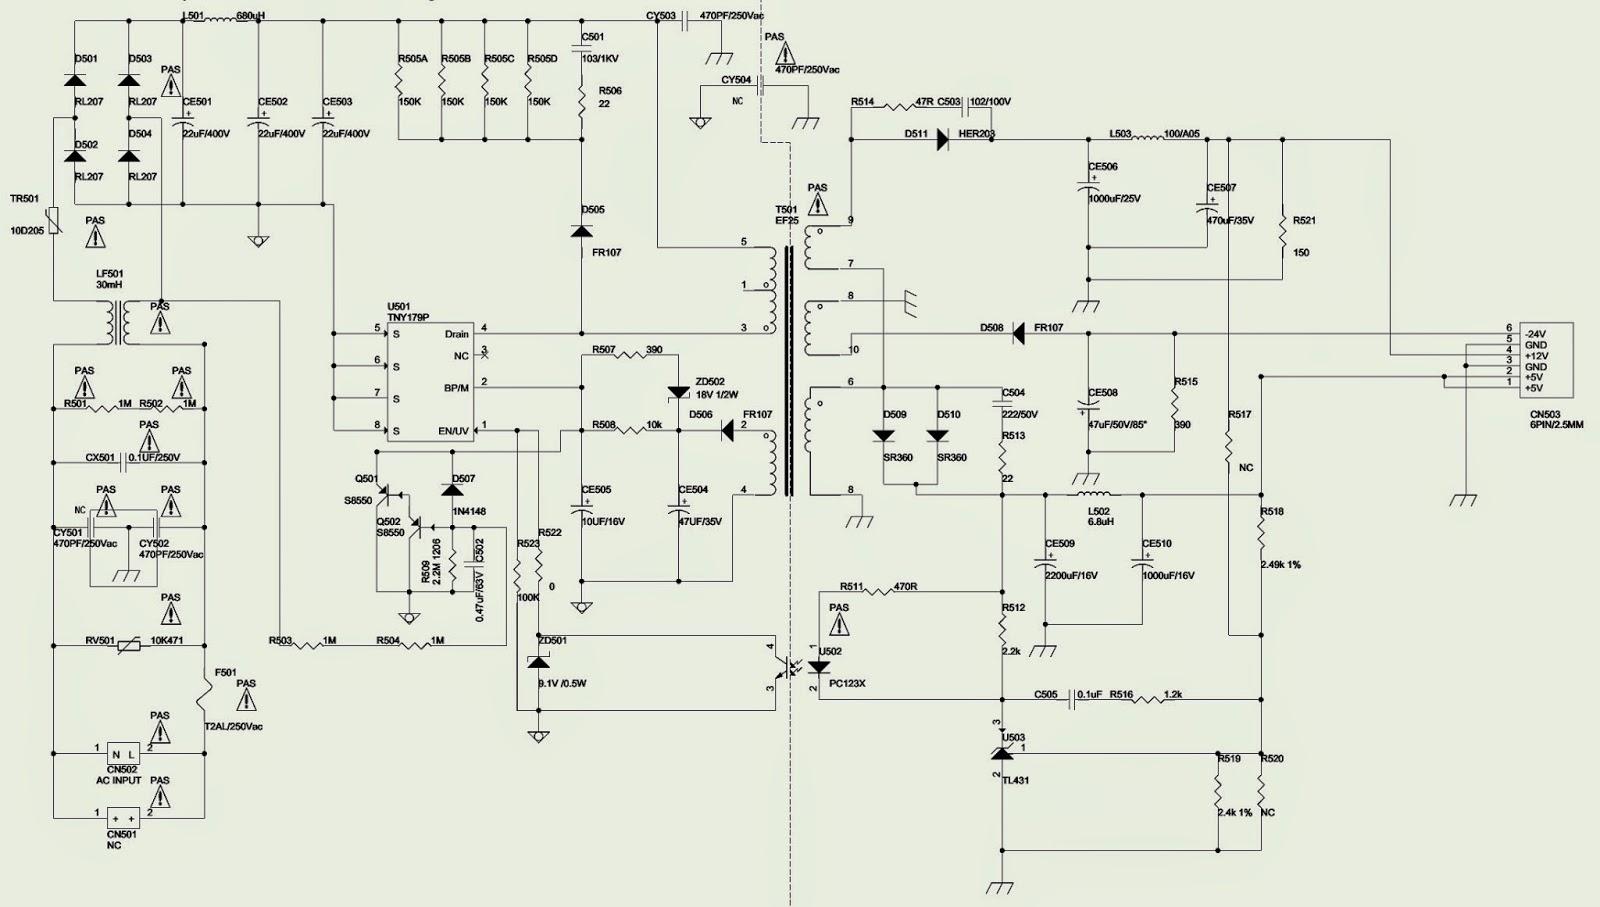 120v receptacle wiring diagram how do you a stem and leaf blu ray player harman kardon bdt 3 30 240v